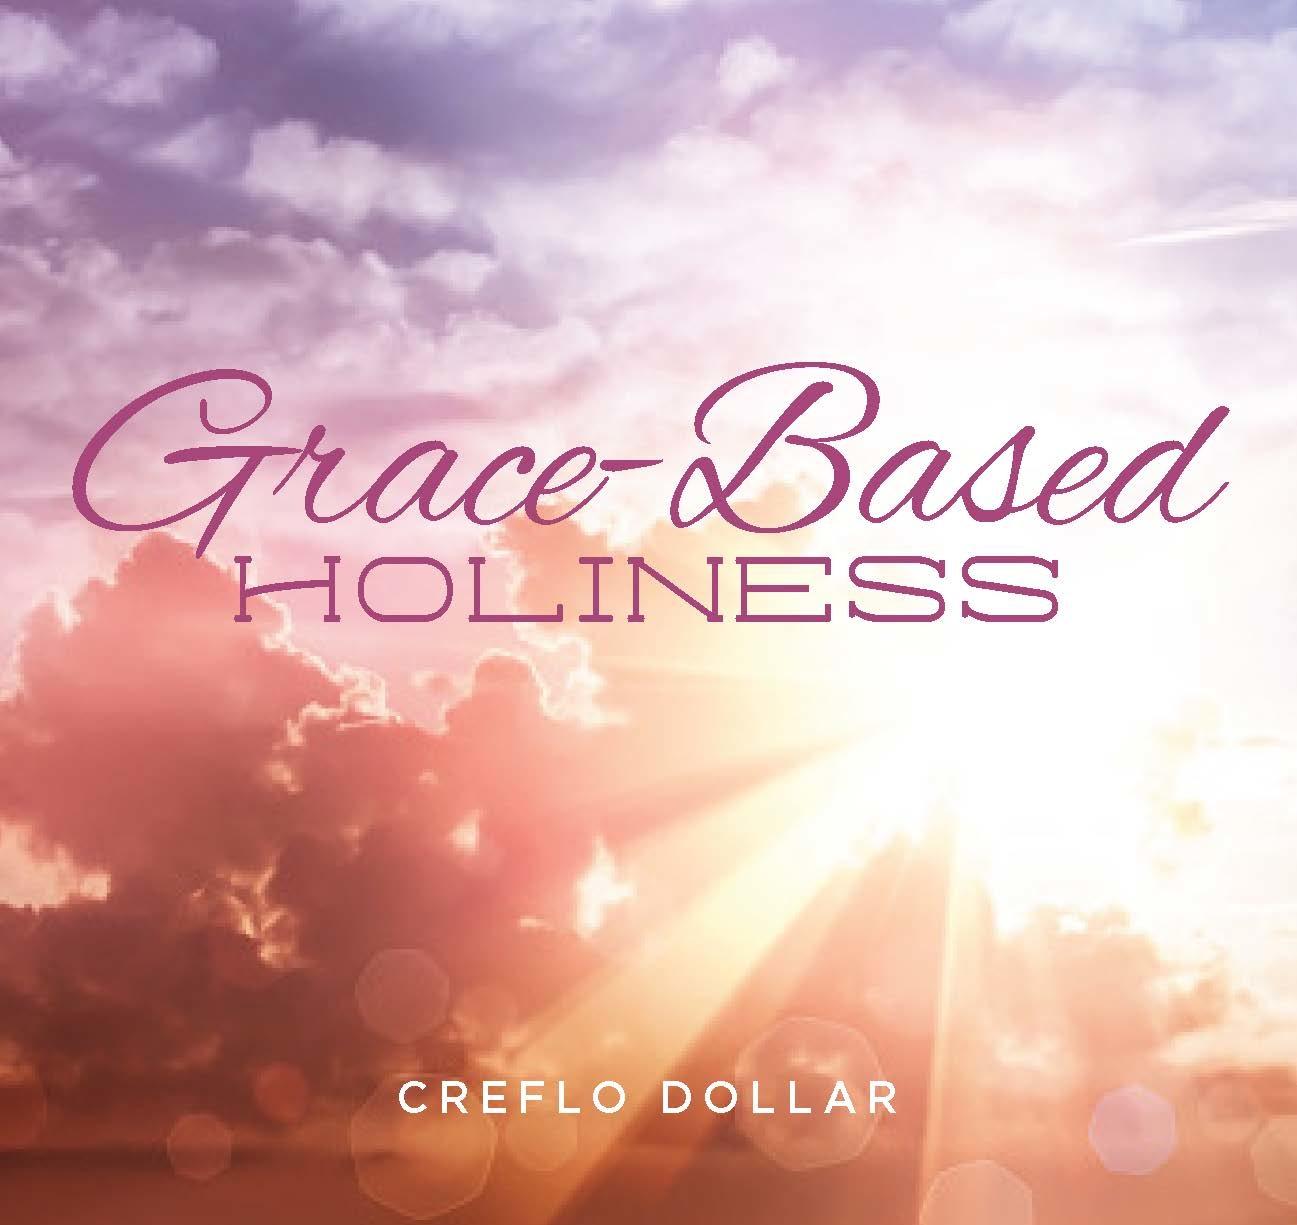 Grace-Based Holiness - DVD Single